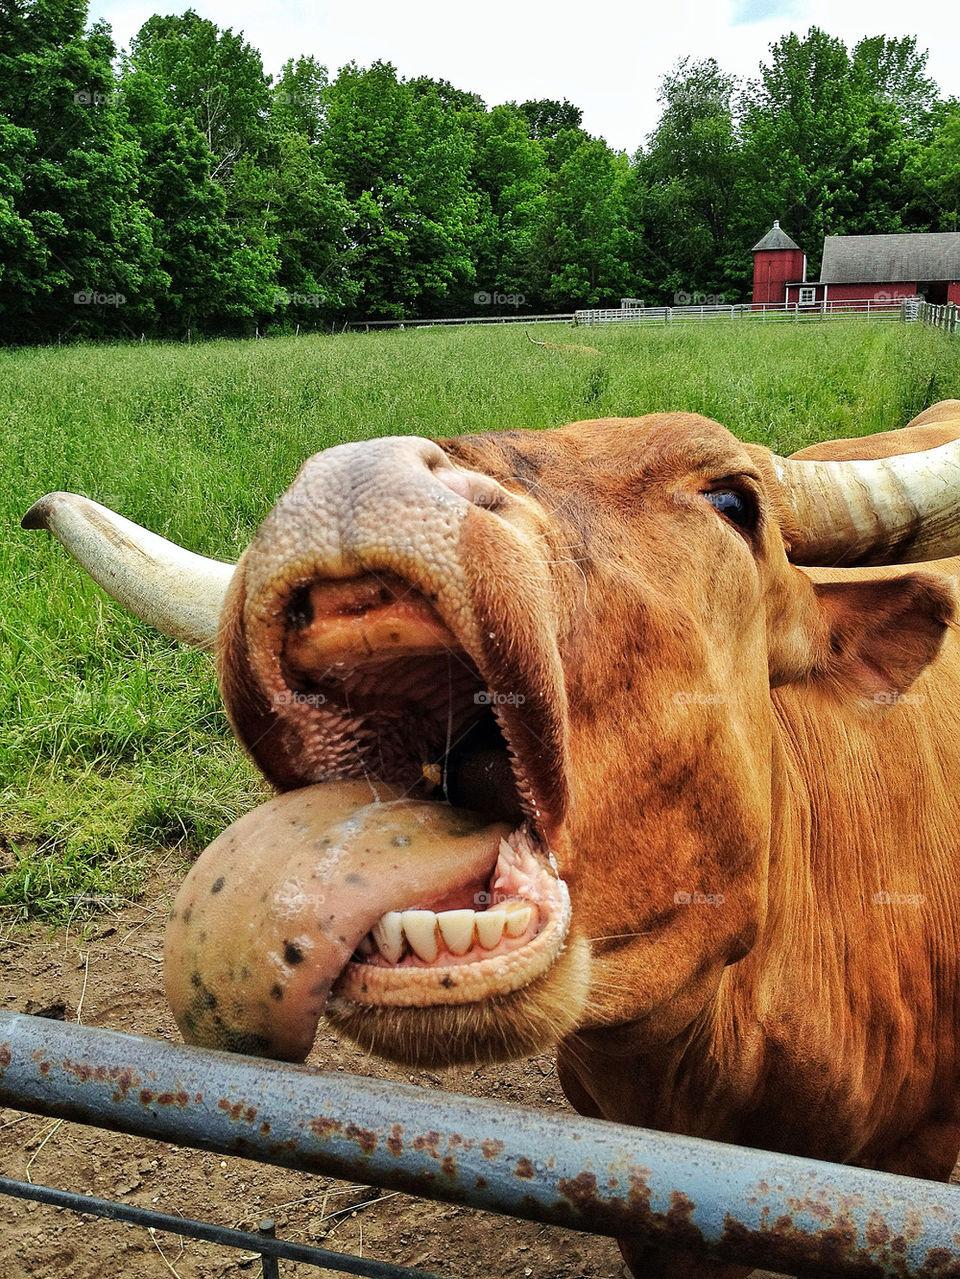 Close-up a cow